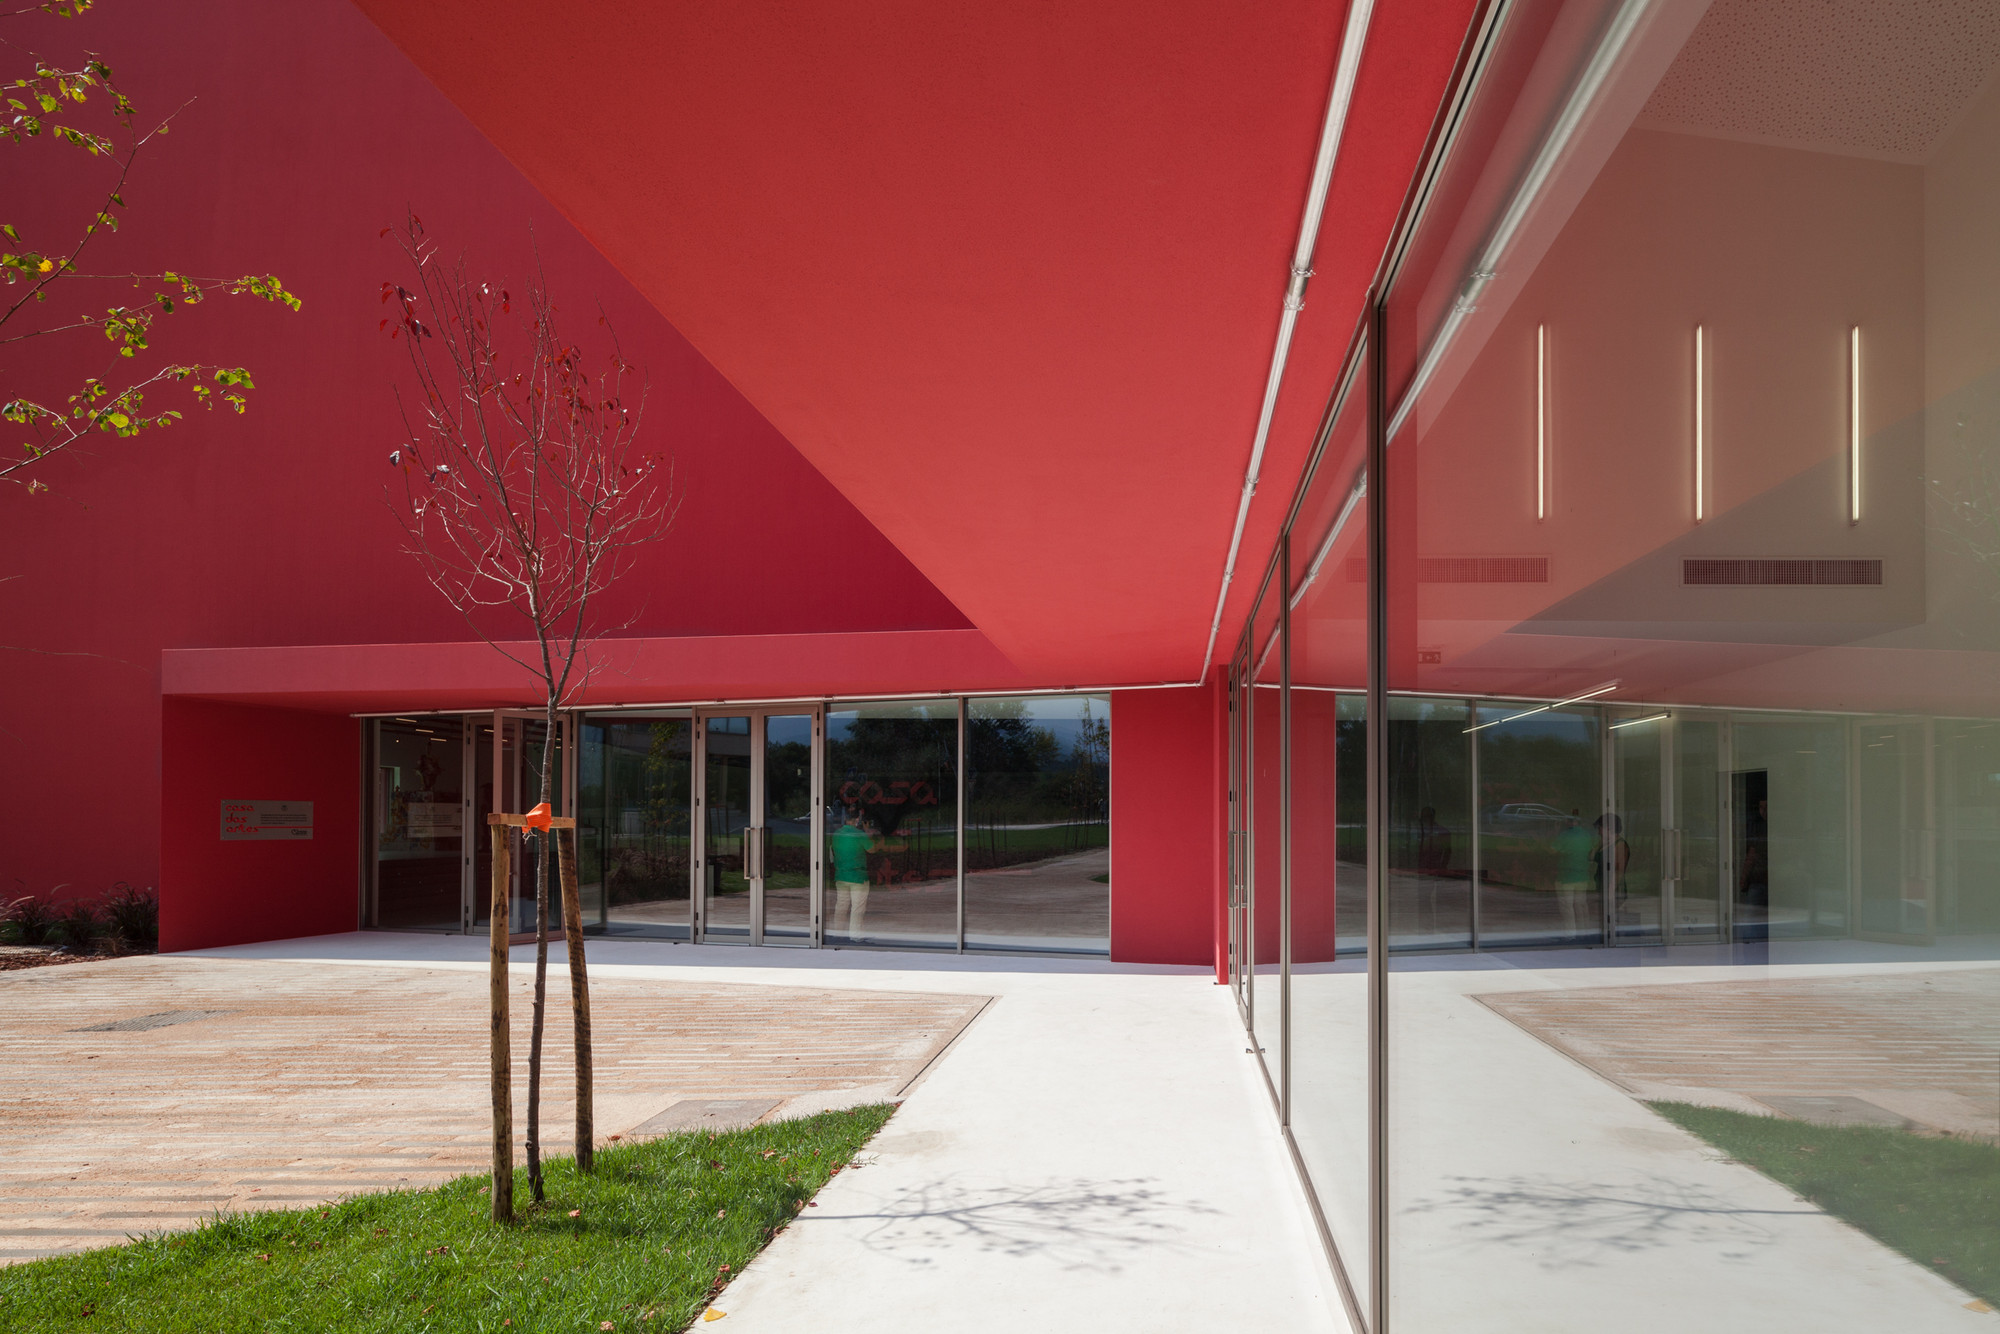 future architecture thinking - 900×600